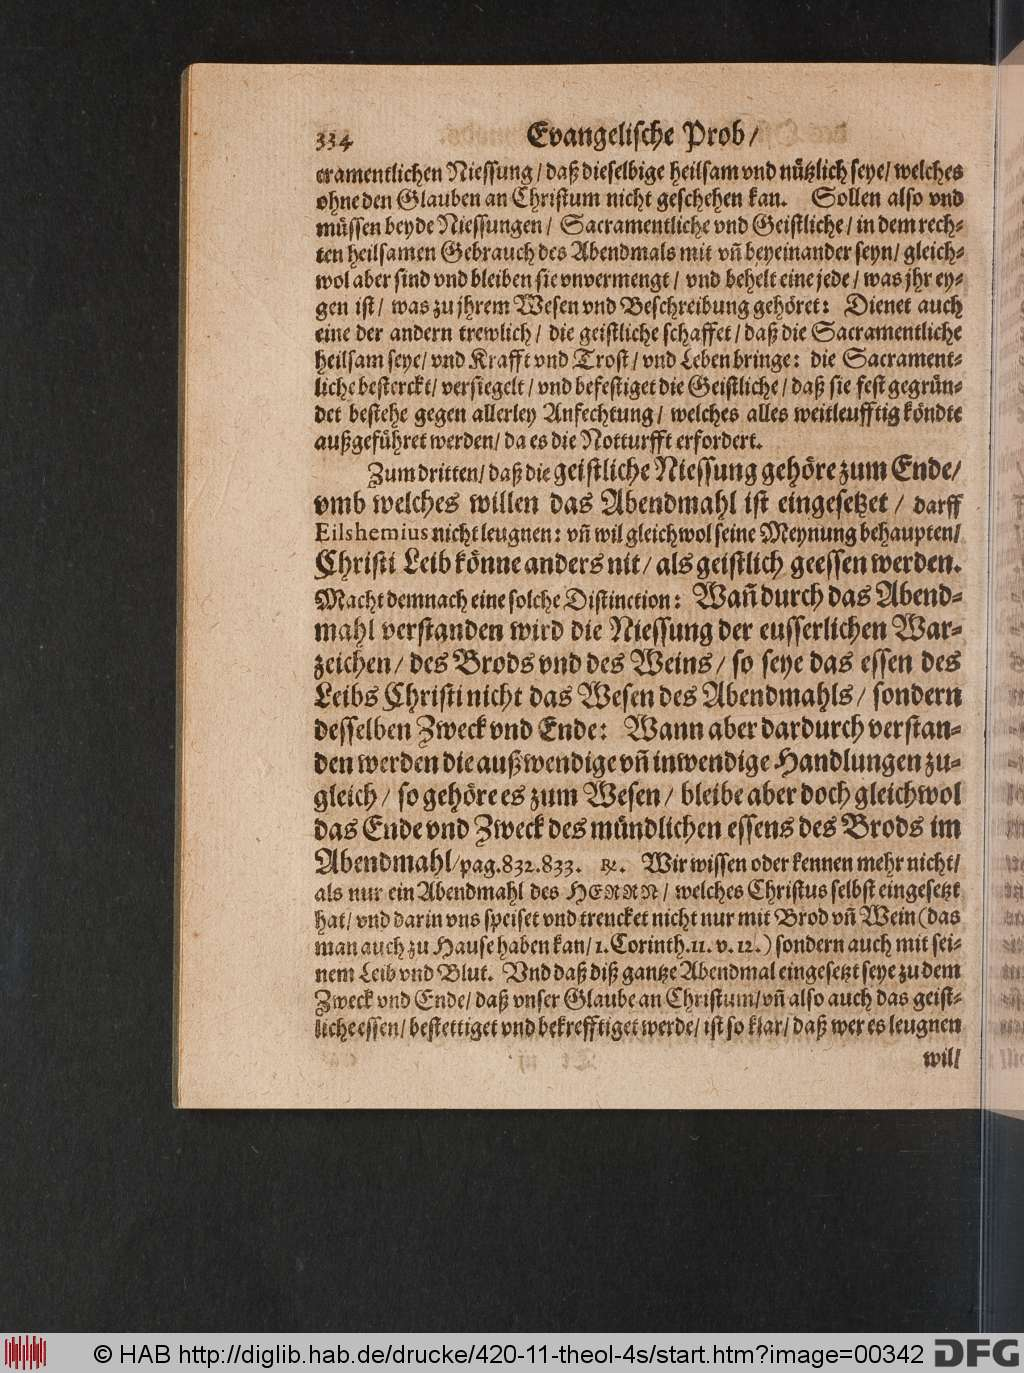 http://diglib.hab.de/drucke/420-11-theol-4s/00342.jpg